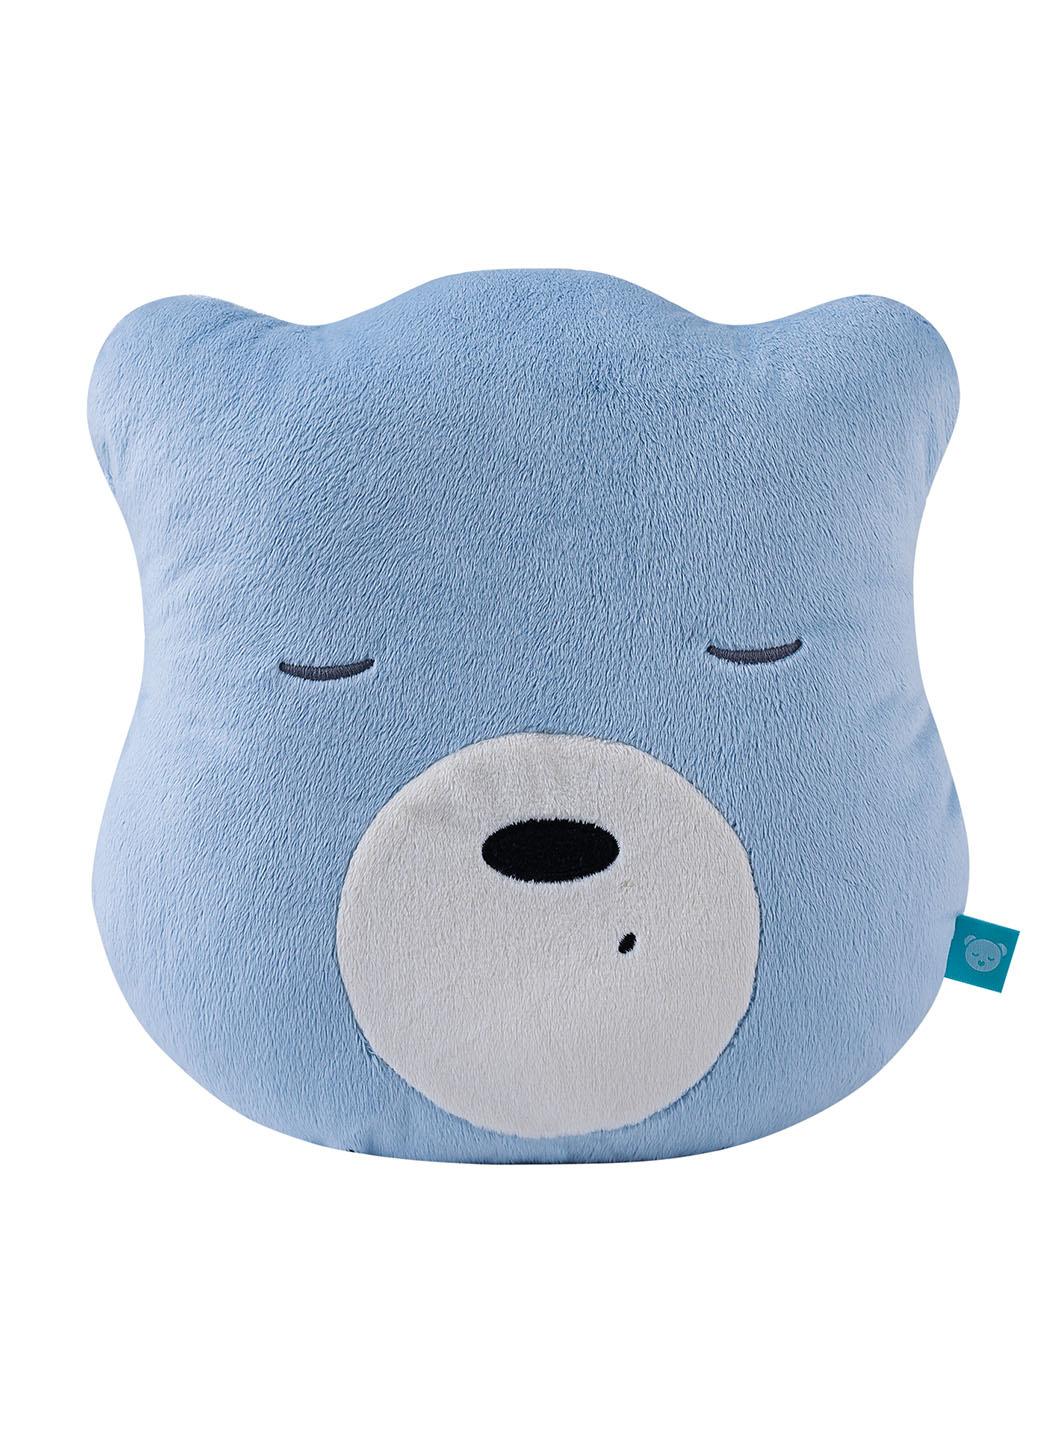 myHummy Kissen - Blau